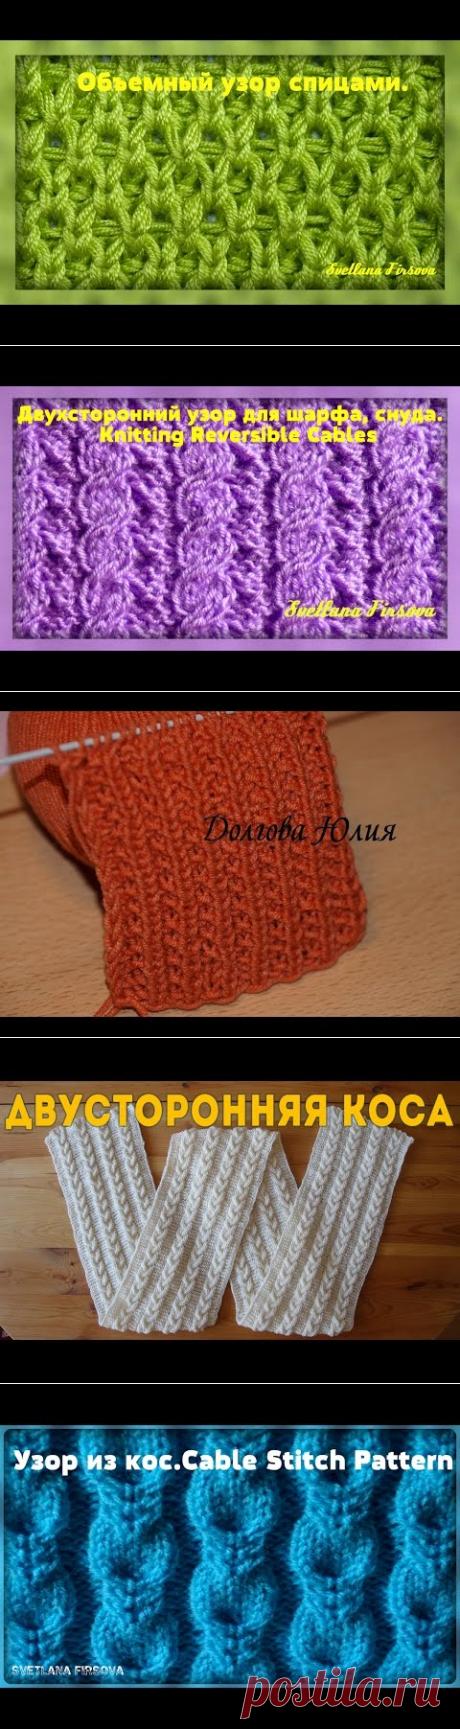 Knitting Reversible Cables Двухсторонний узор спицами для шарфа, снуда - YouTube